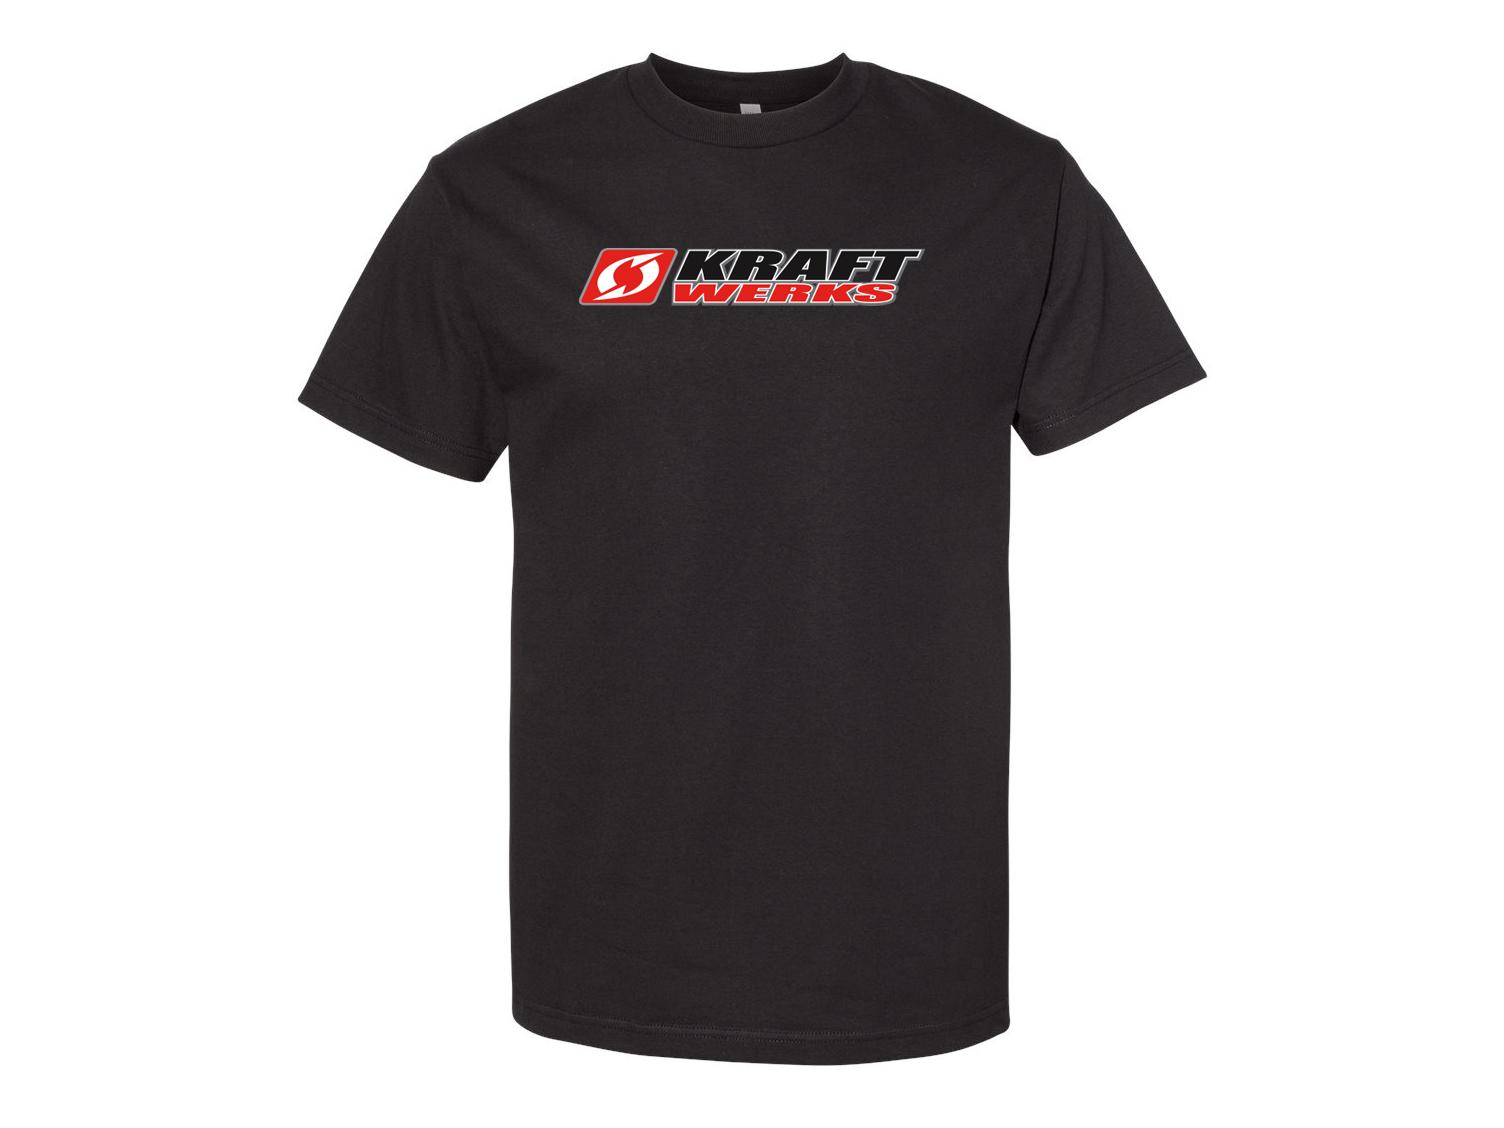 KraftWerks  T-Shirt - Medium - Black